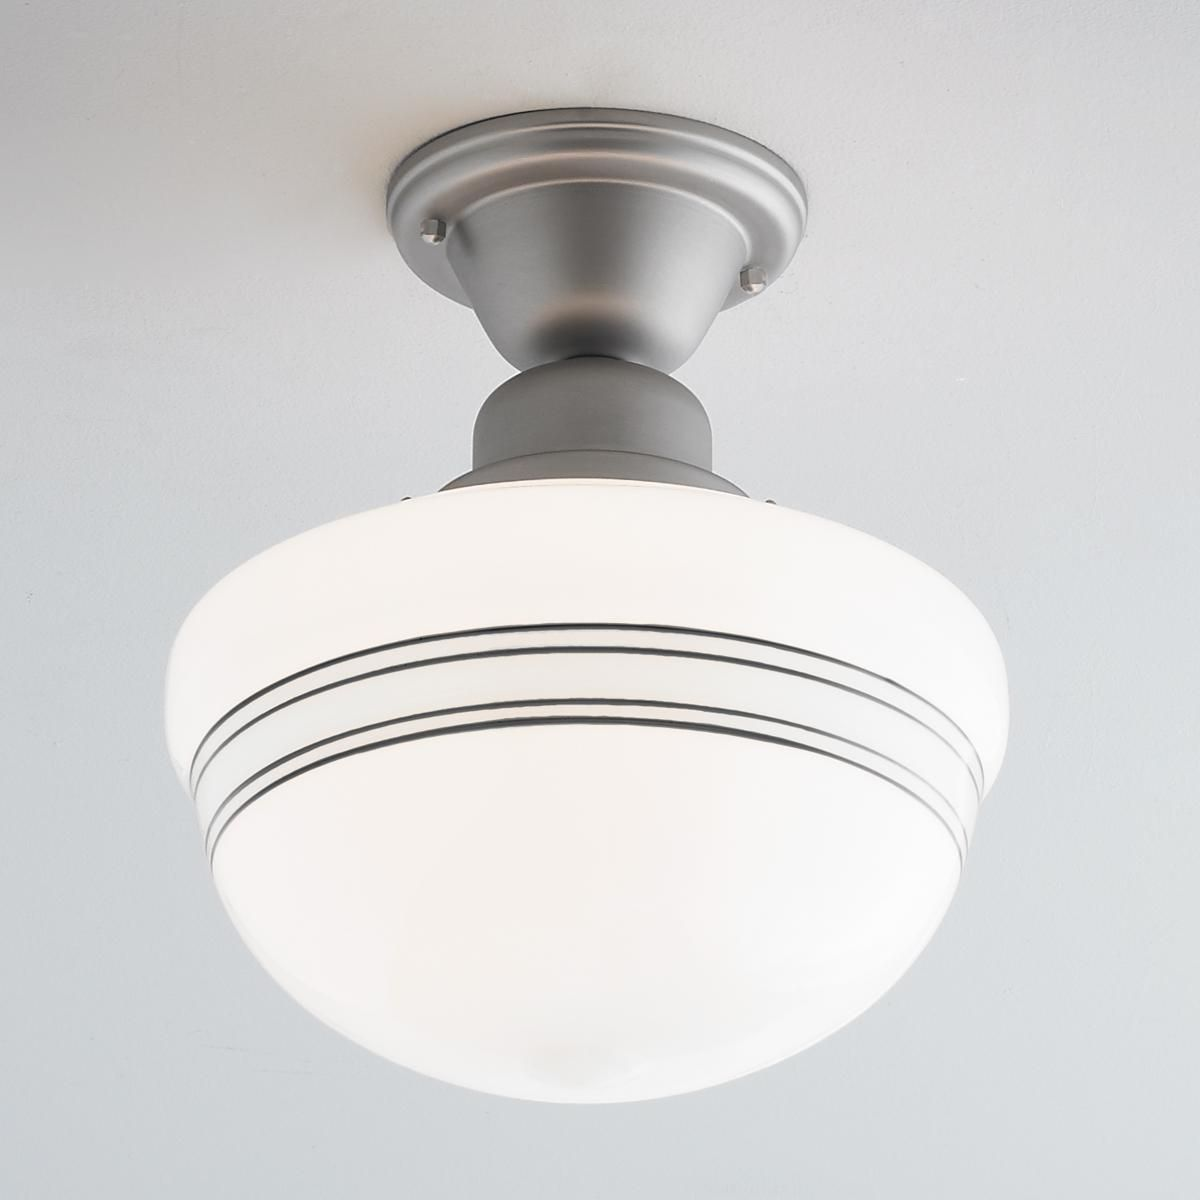 sku seeded light house school pendant ceiling schoolhouse polished glass clear one chrome